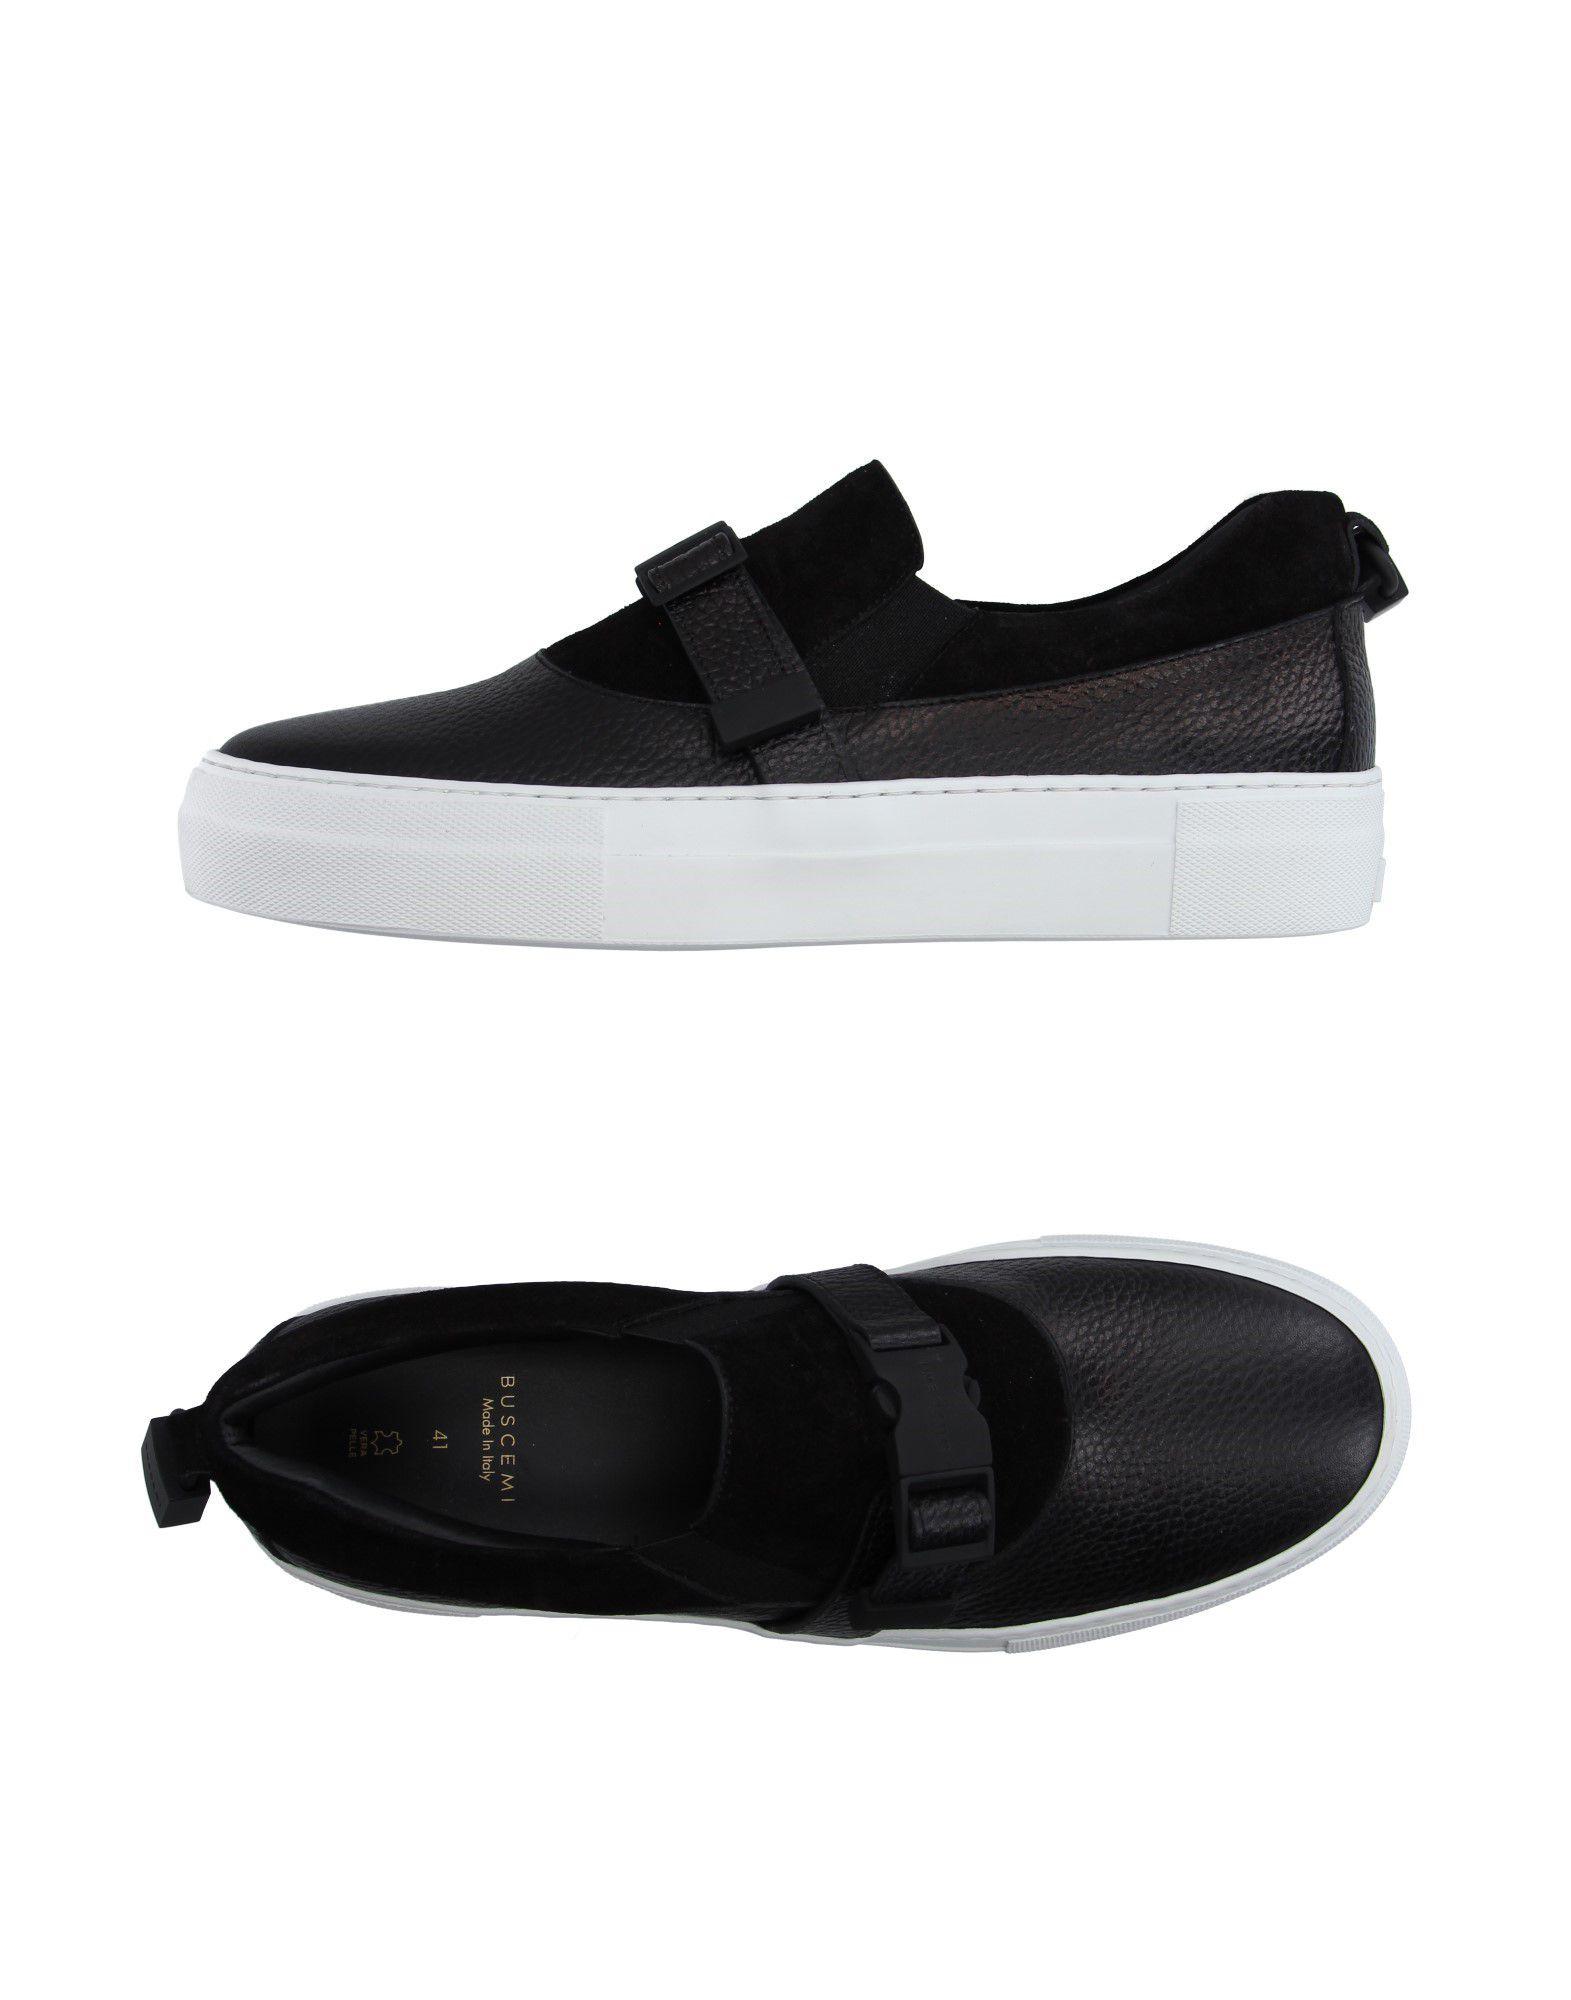 Buscemi Sneakers Herren  11127947DC Gute Qualität beliebte Schuhe